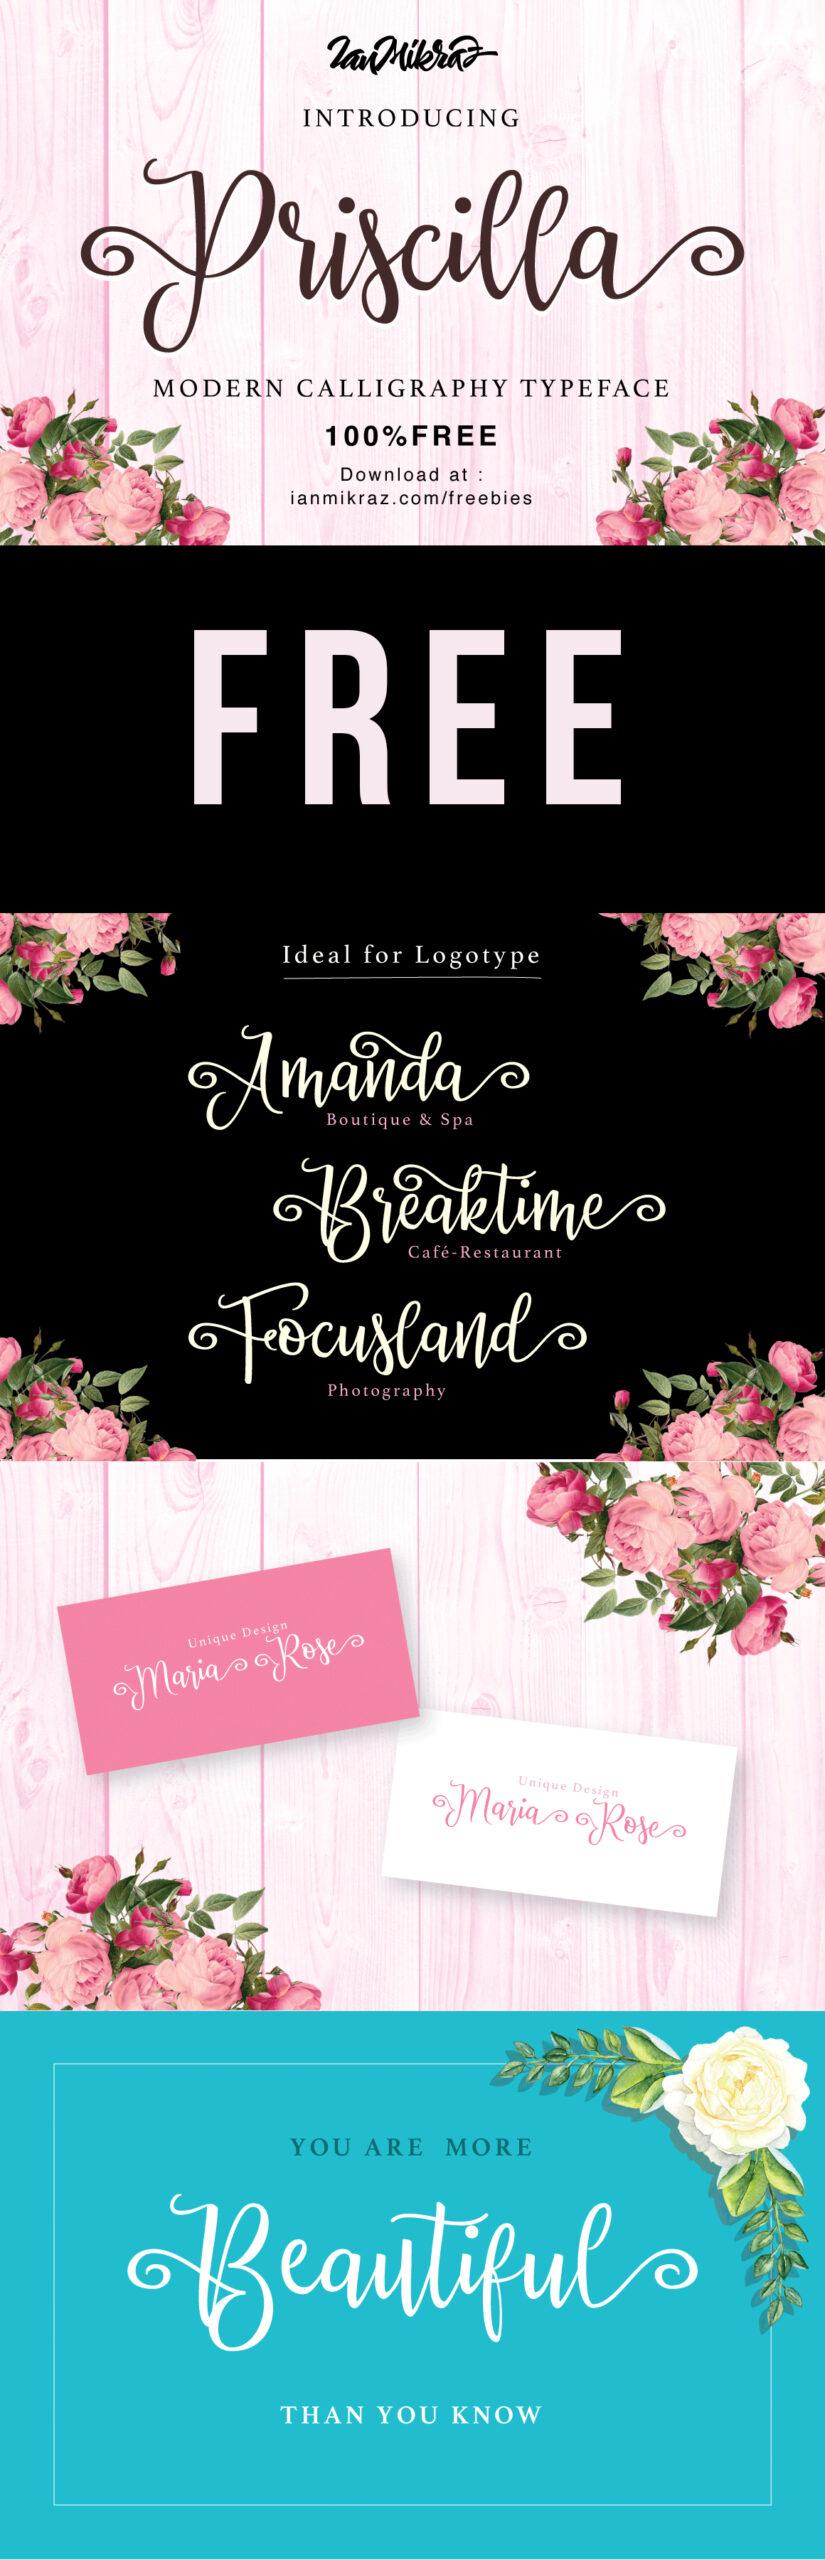 free-priscilla-font-1